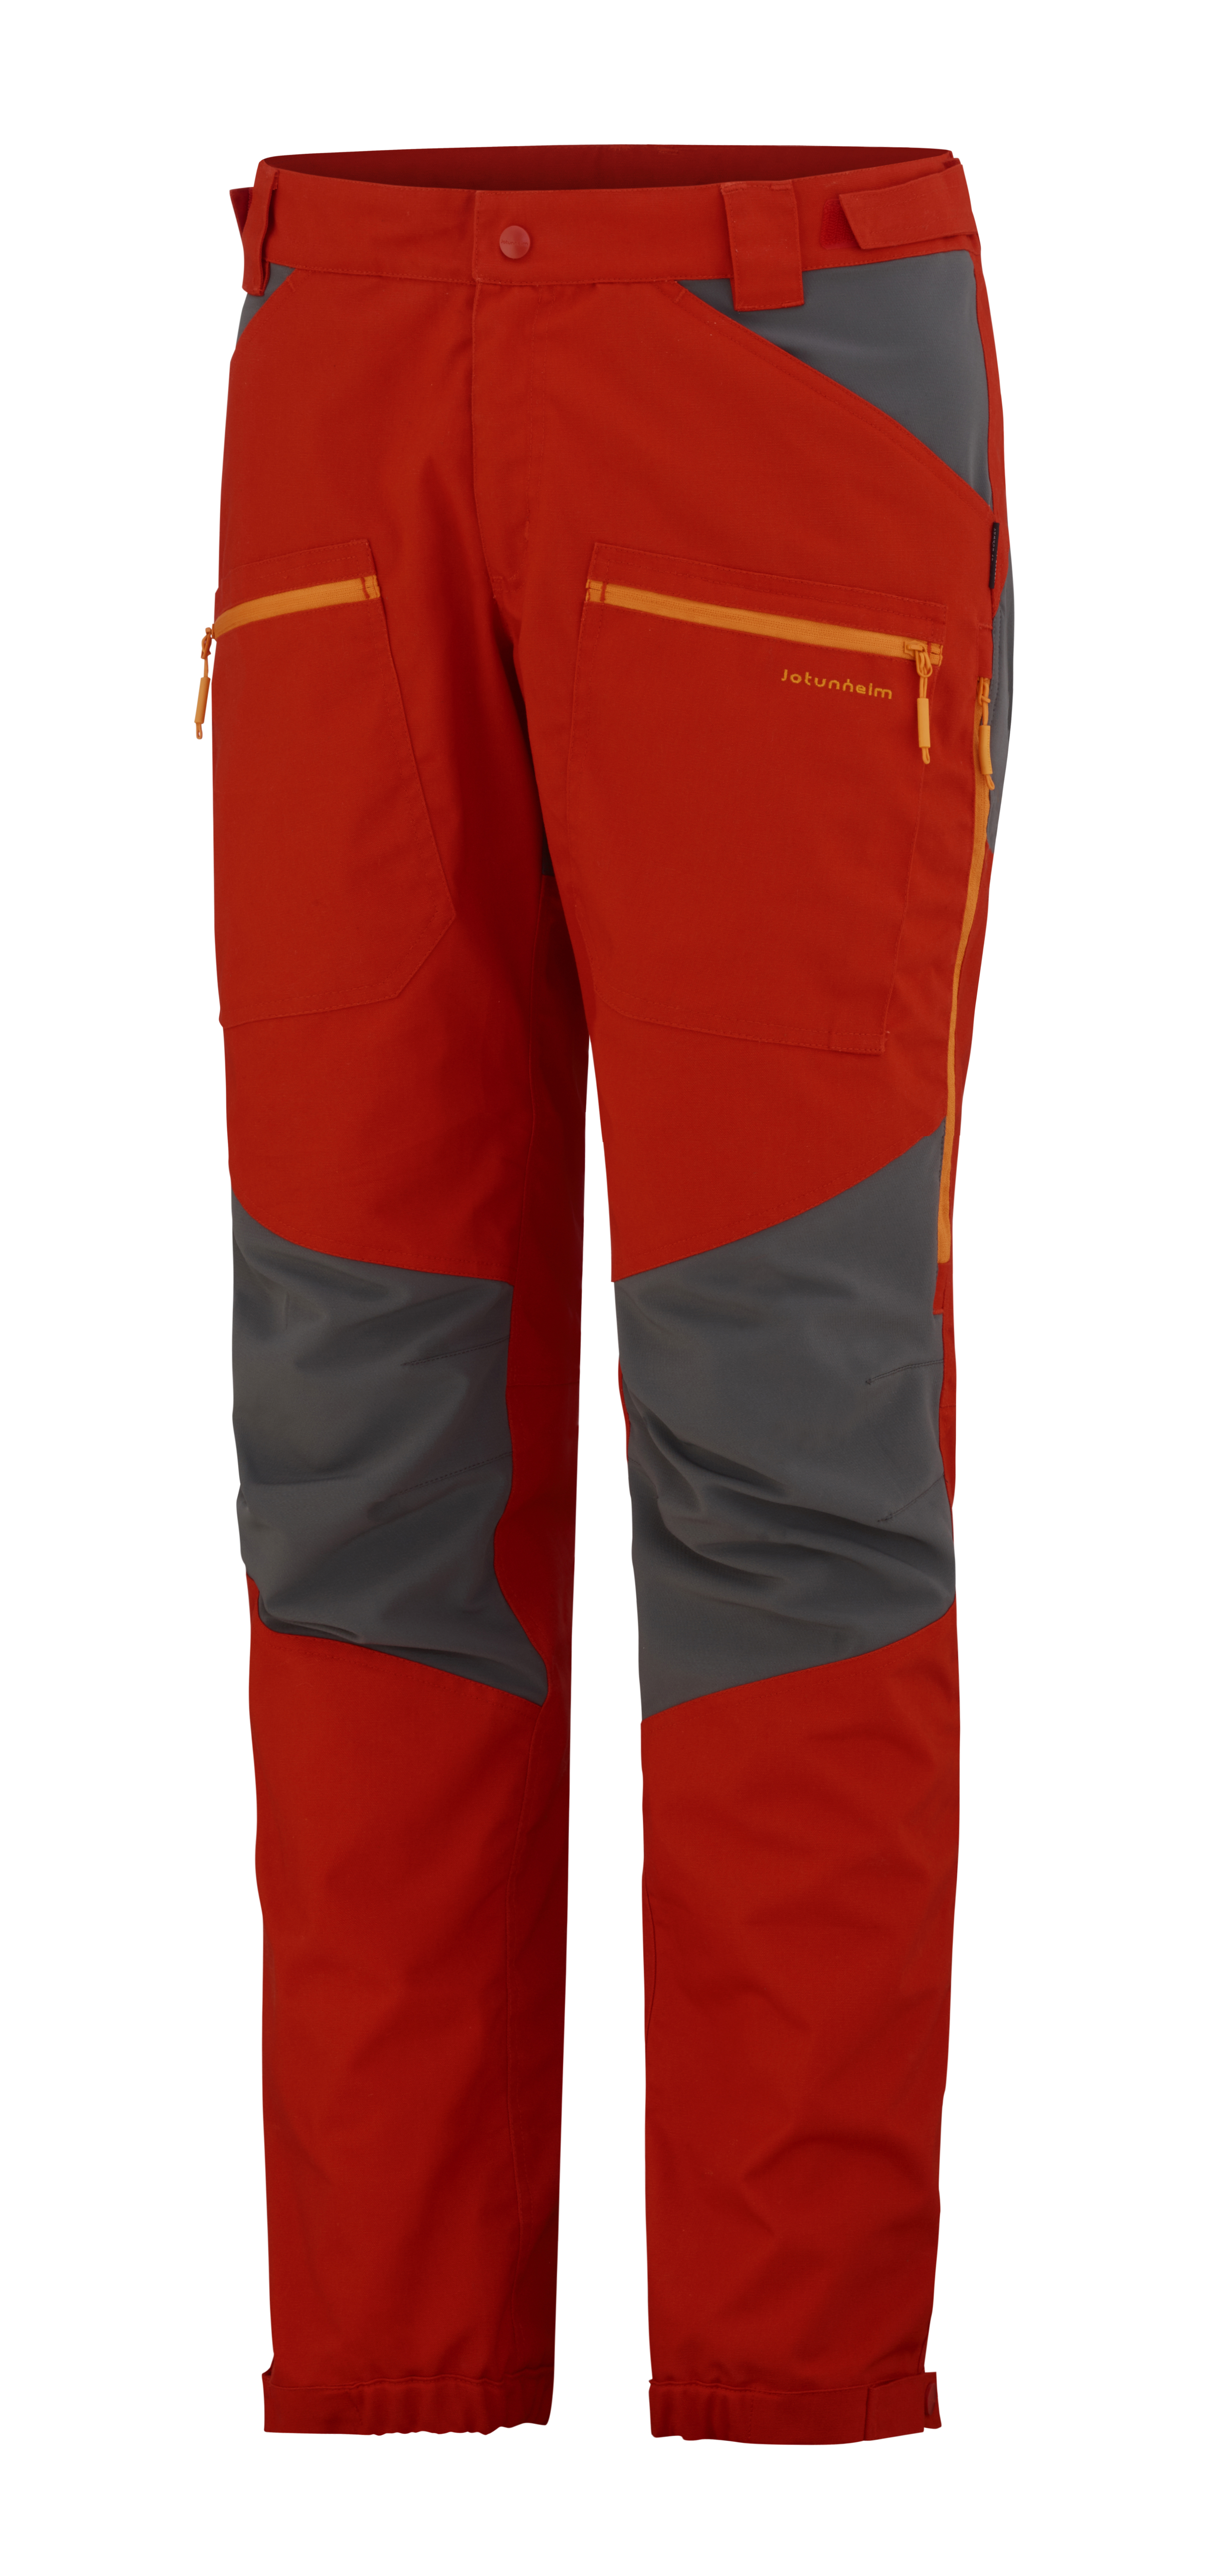 Jotunheim Fossberg Bukse Herre | SportsDeal